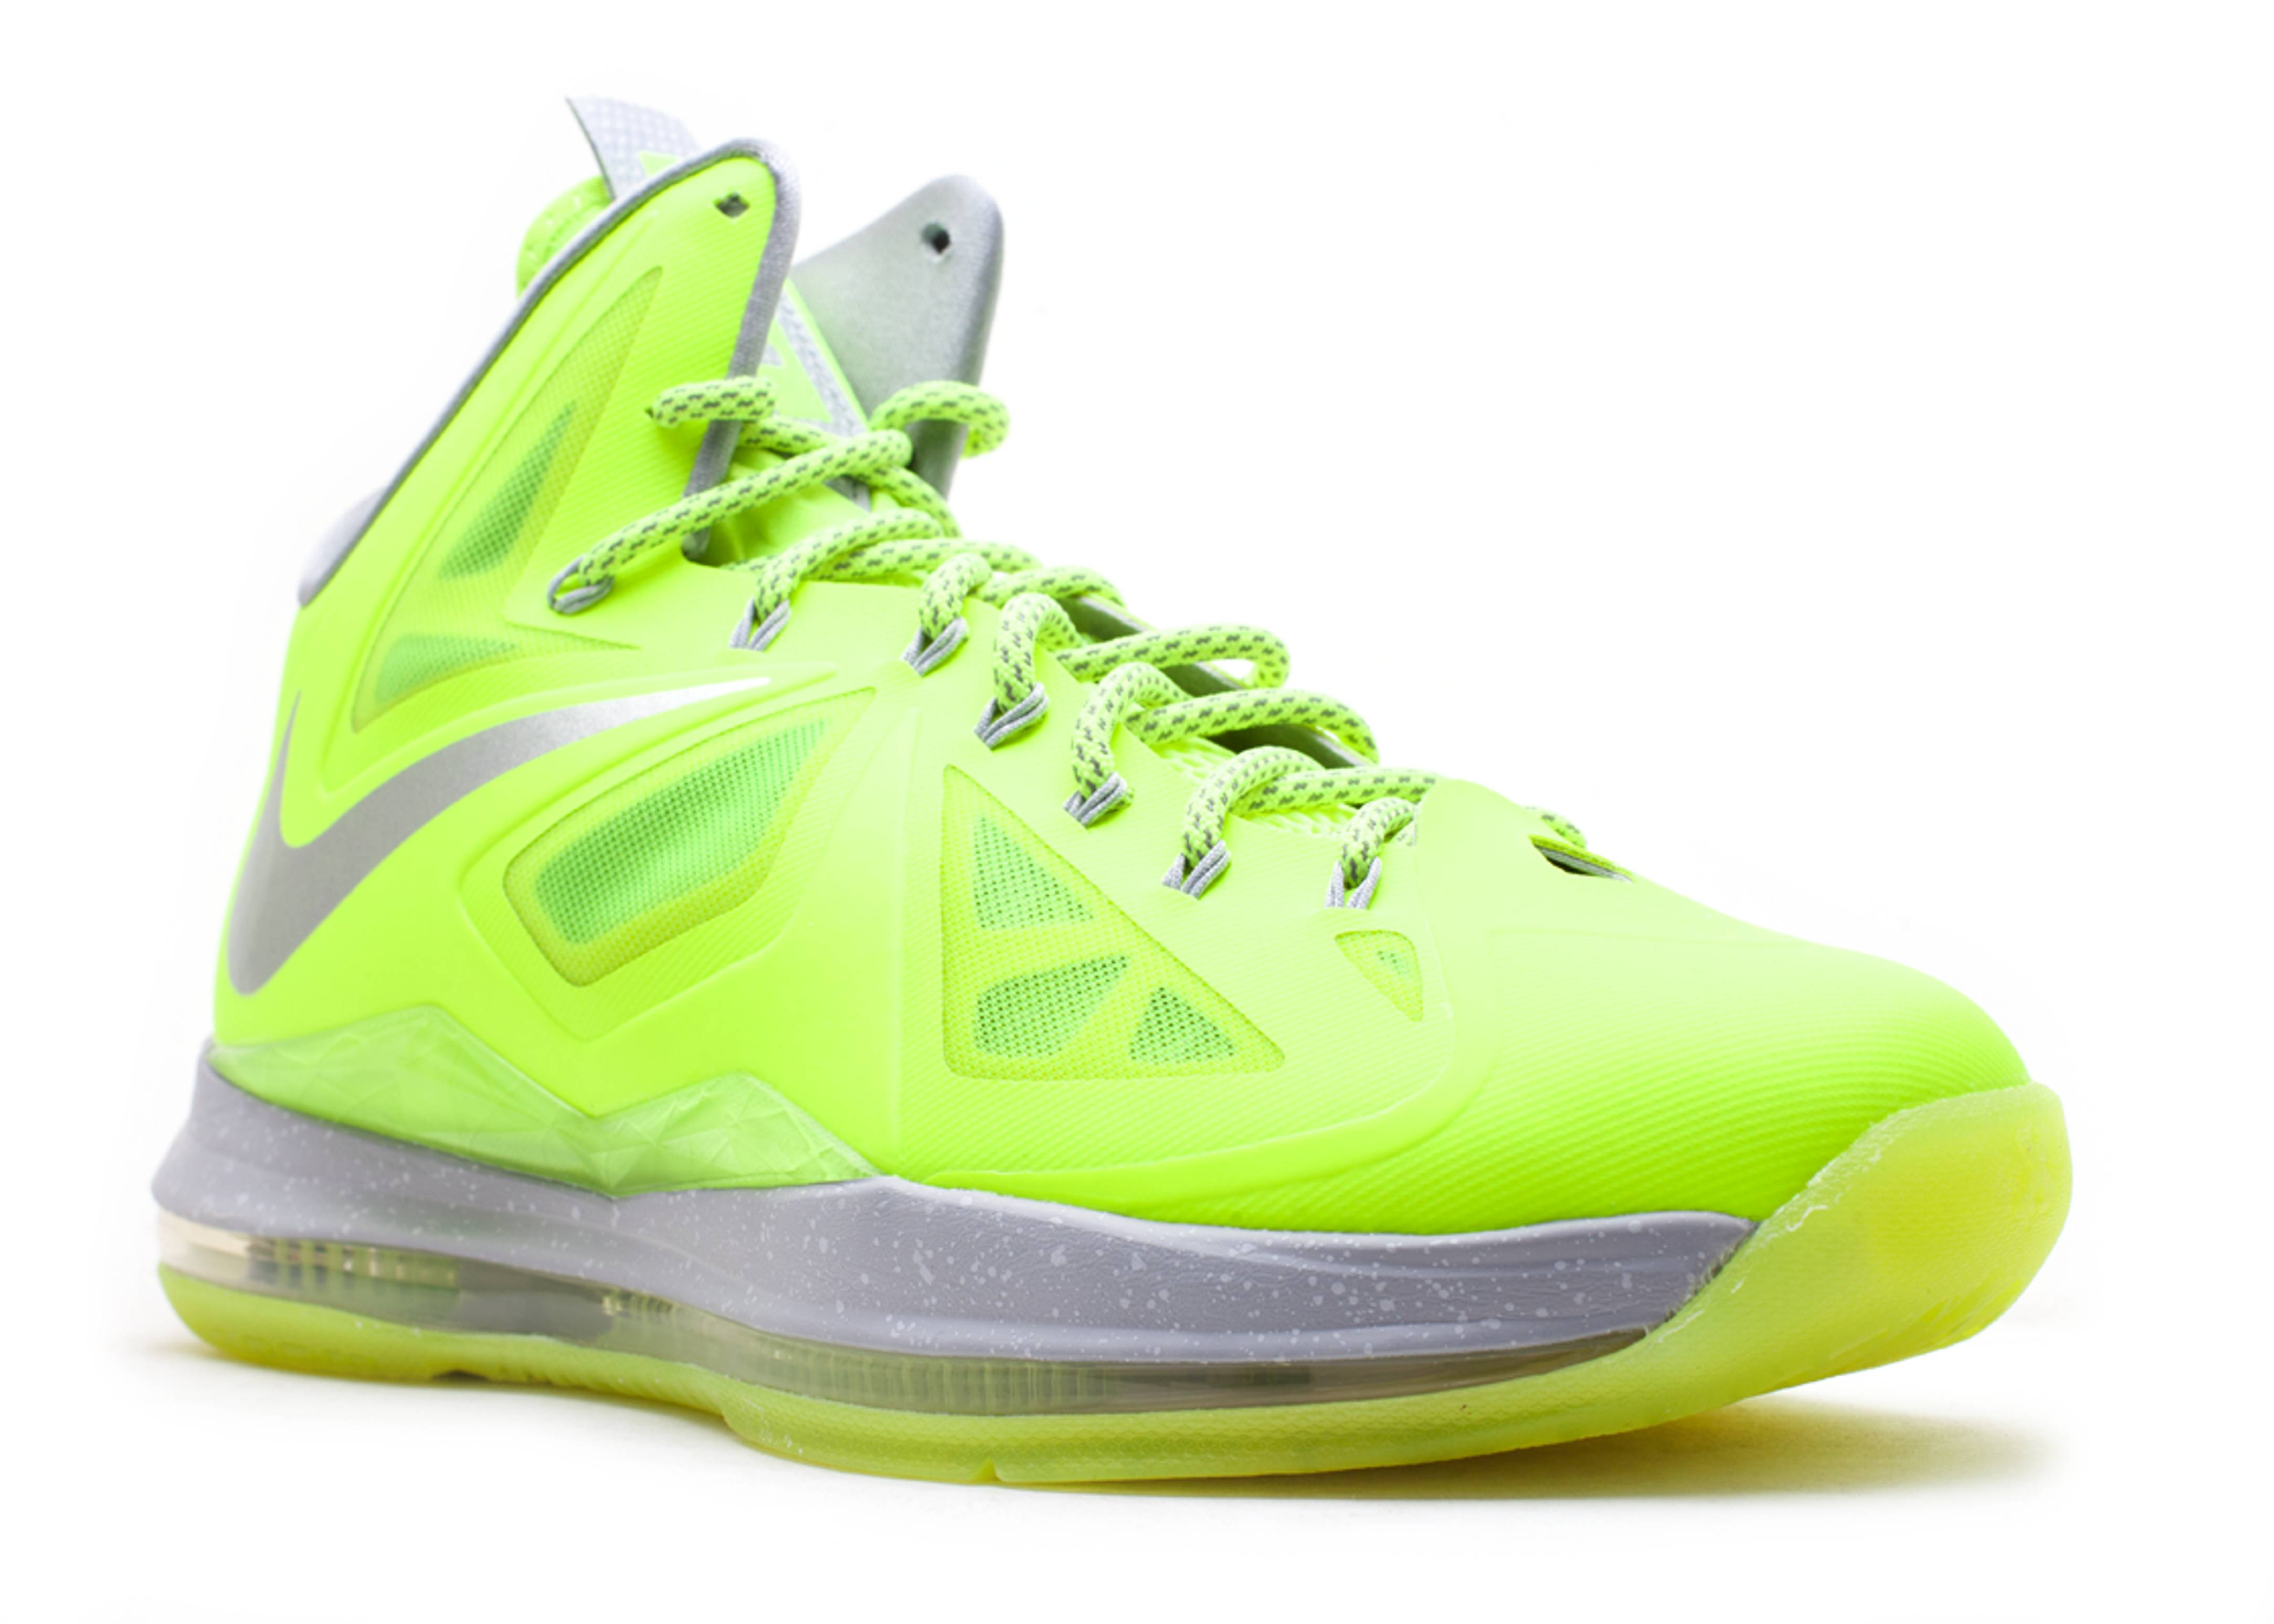 competitive price 23b92 f9e39 Buy Online Nike Lebron X Cheap sale Dunkman Volt Wolf Grey-Pure